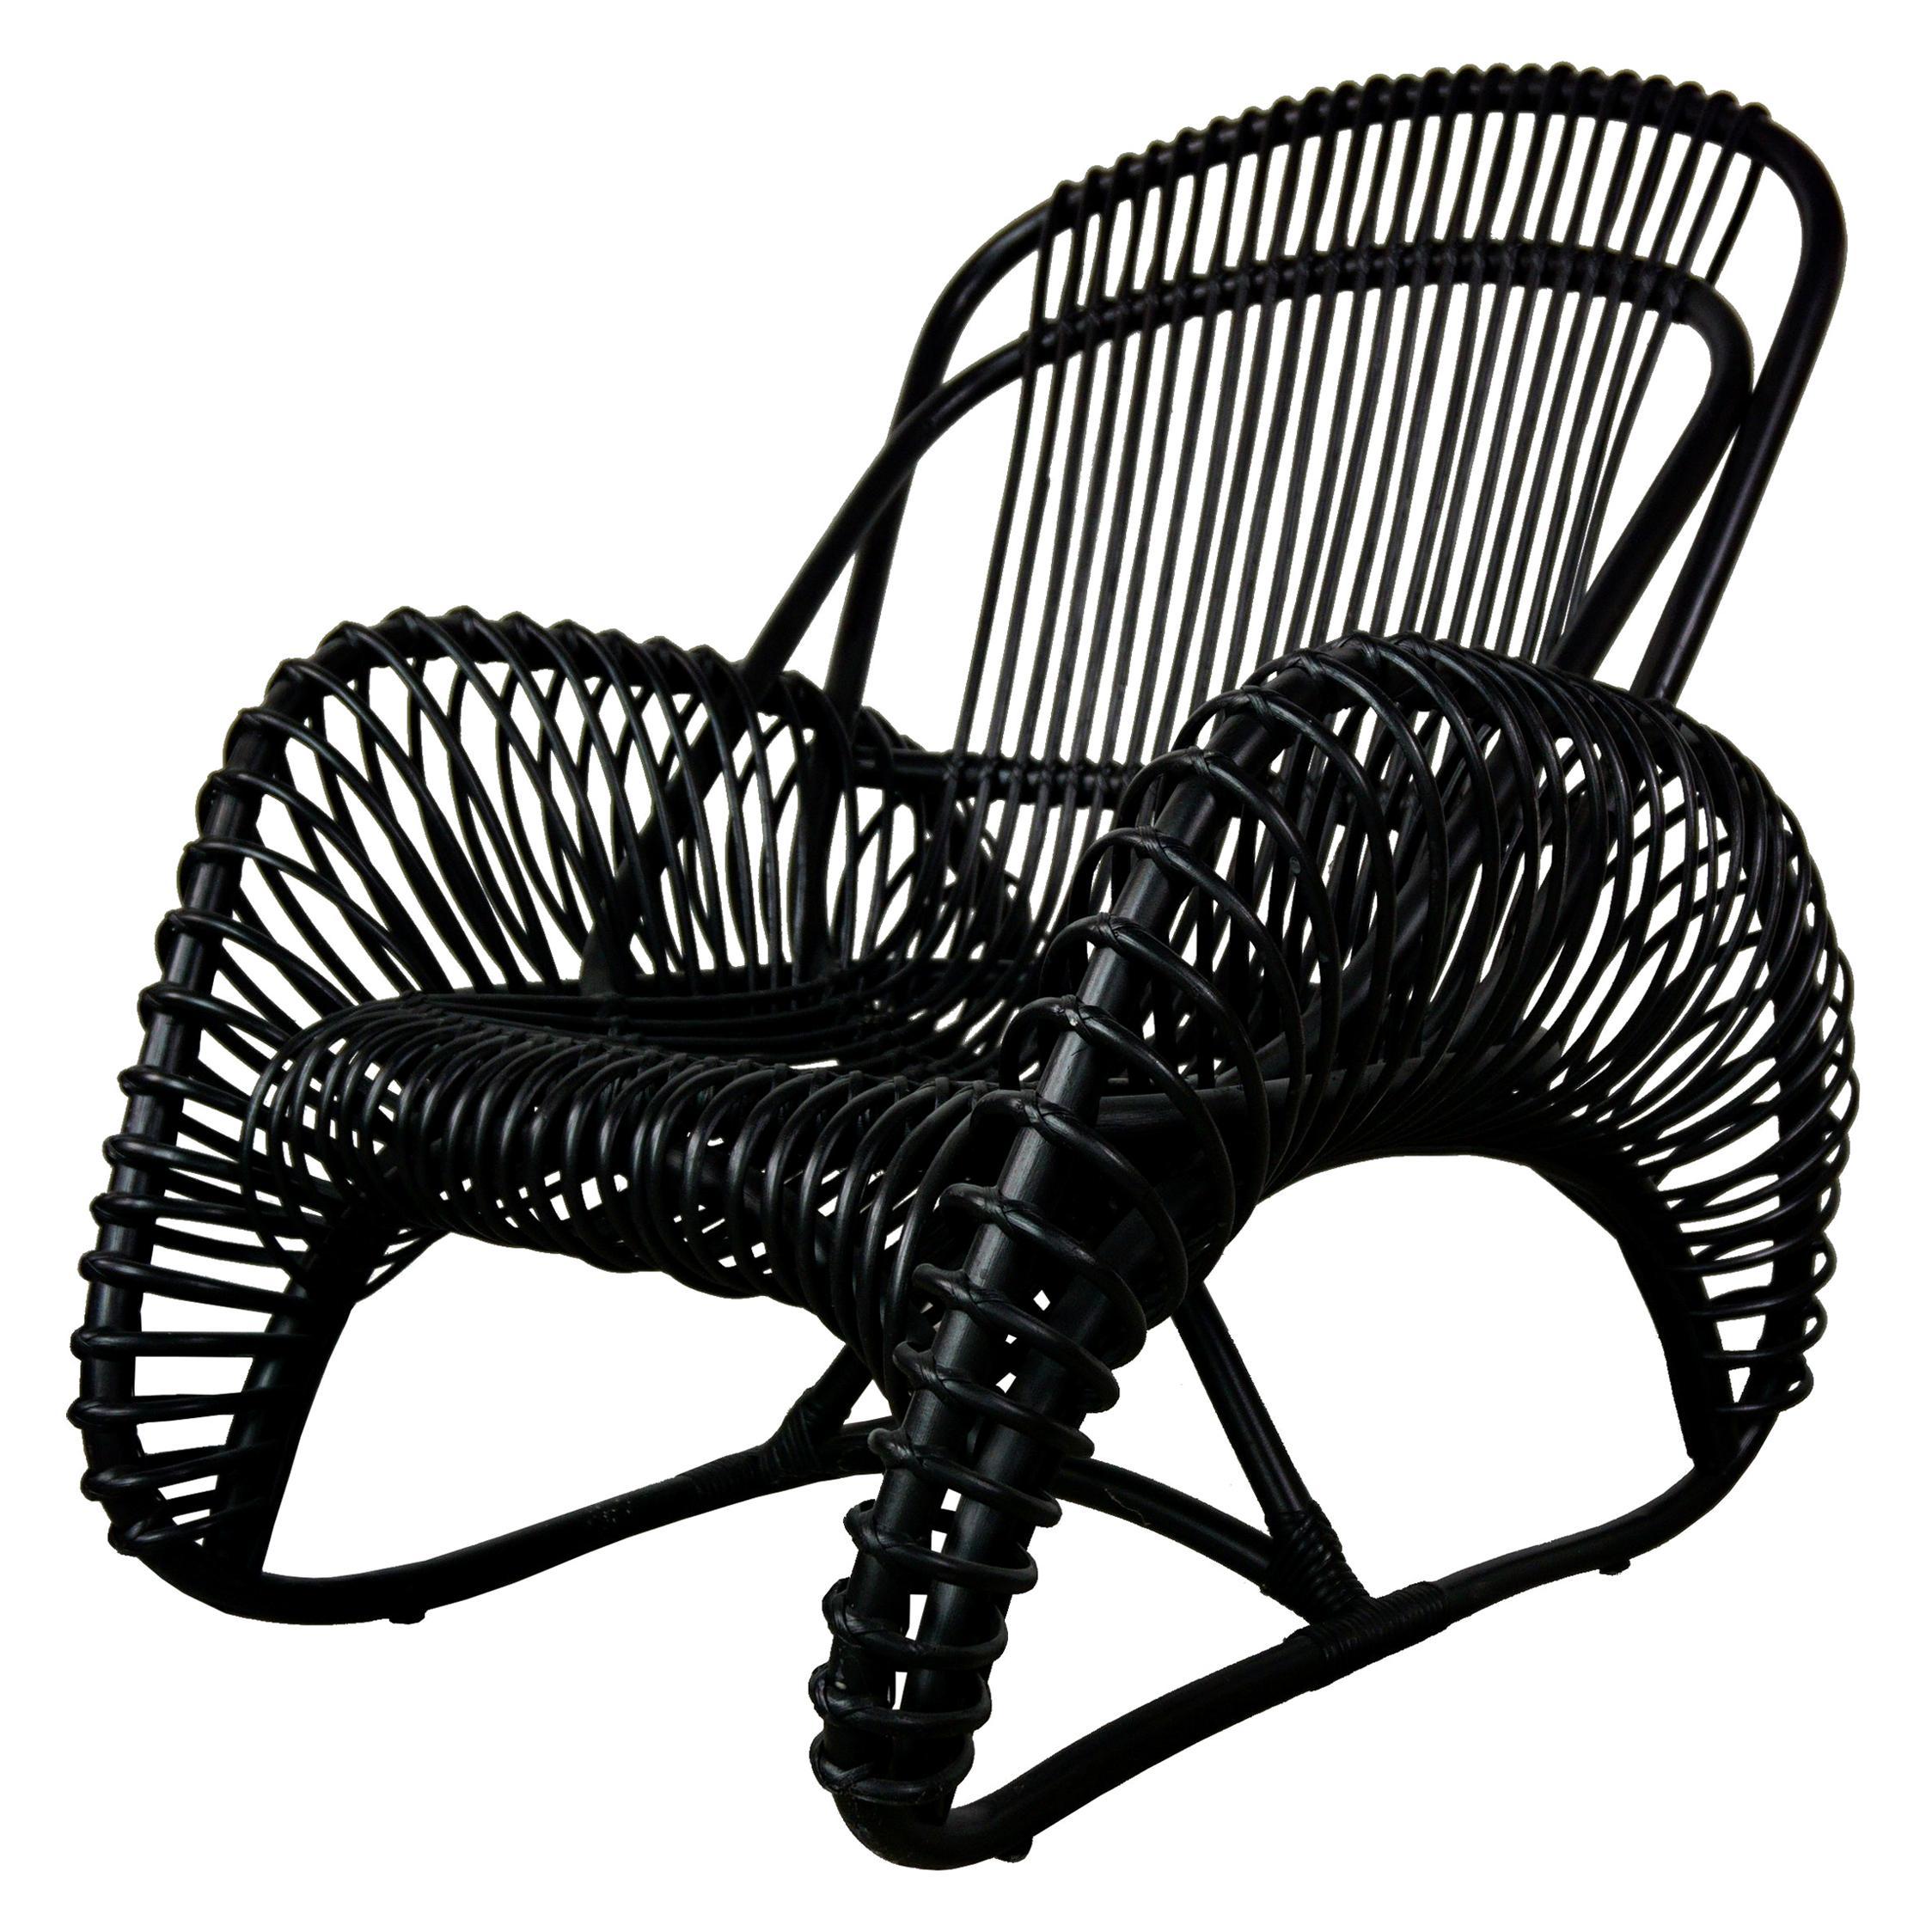 French Design Black Rattan Lounger Armchair